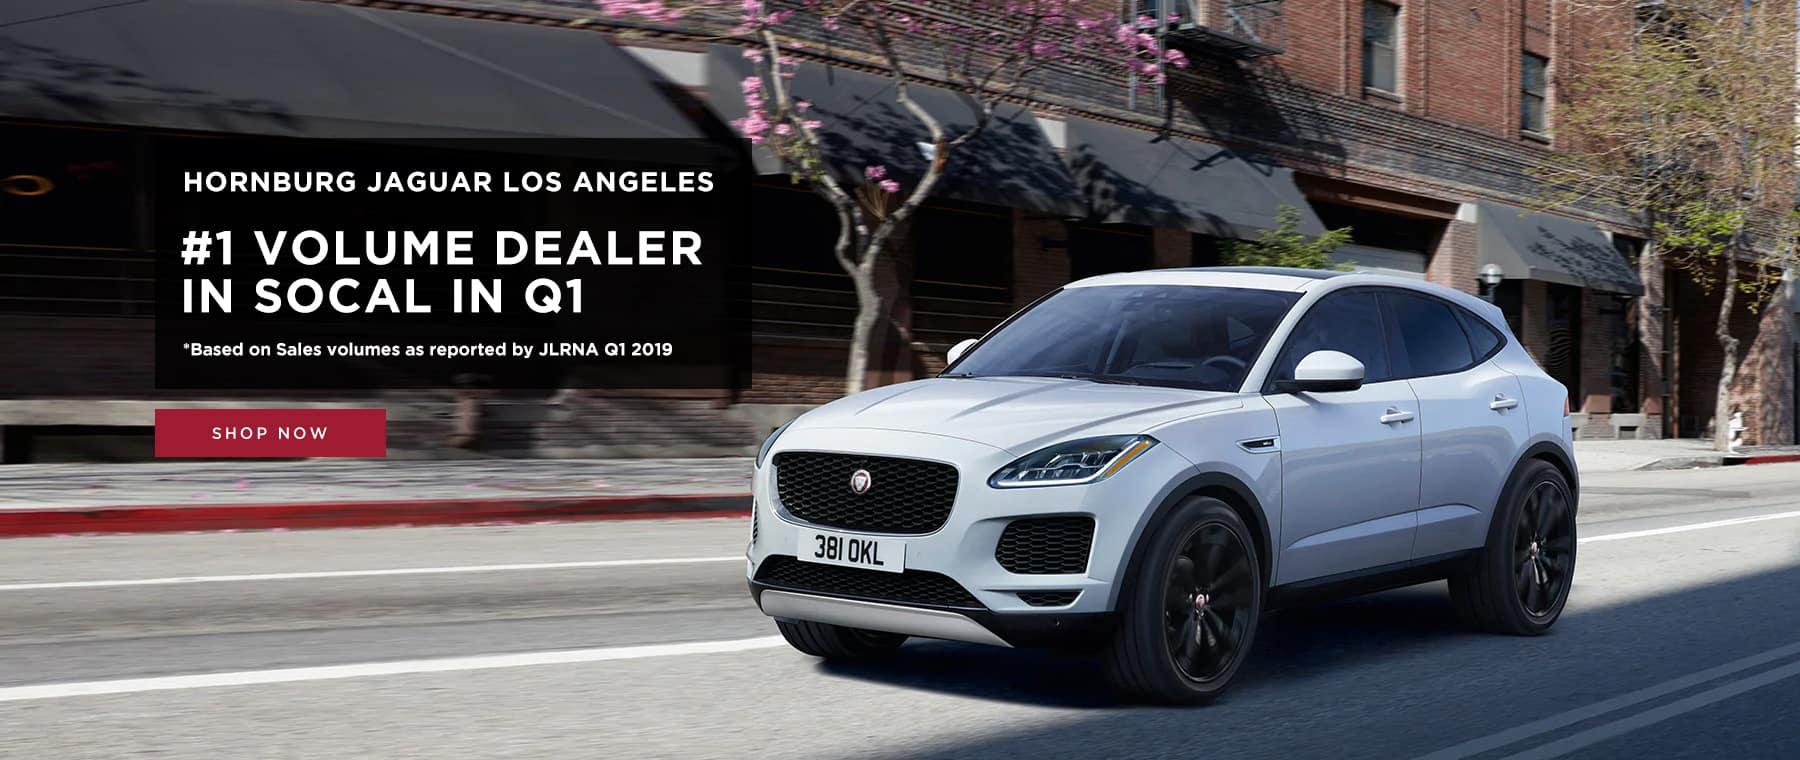 Hyundai Dealership Los Angeles >> Hornburg Jaguar Los Angeles New Used Cars West Hollywood